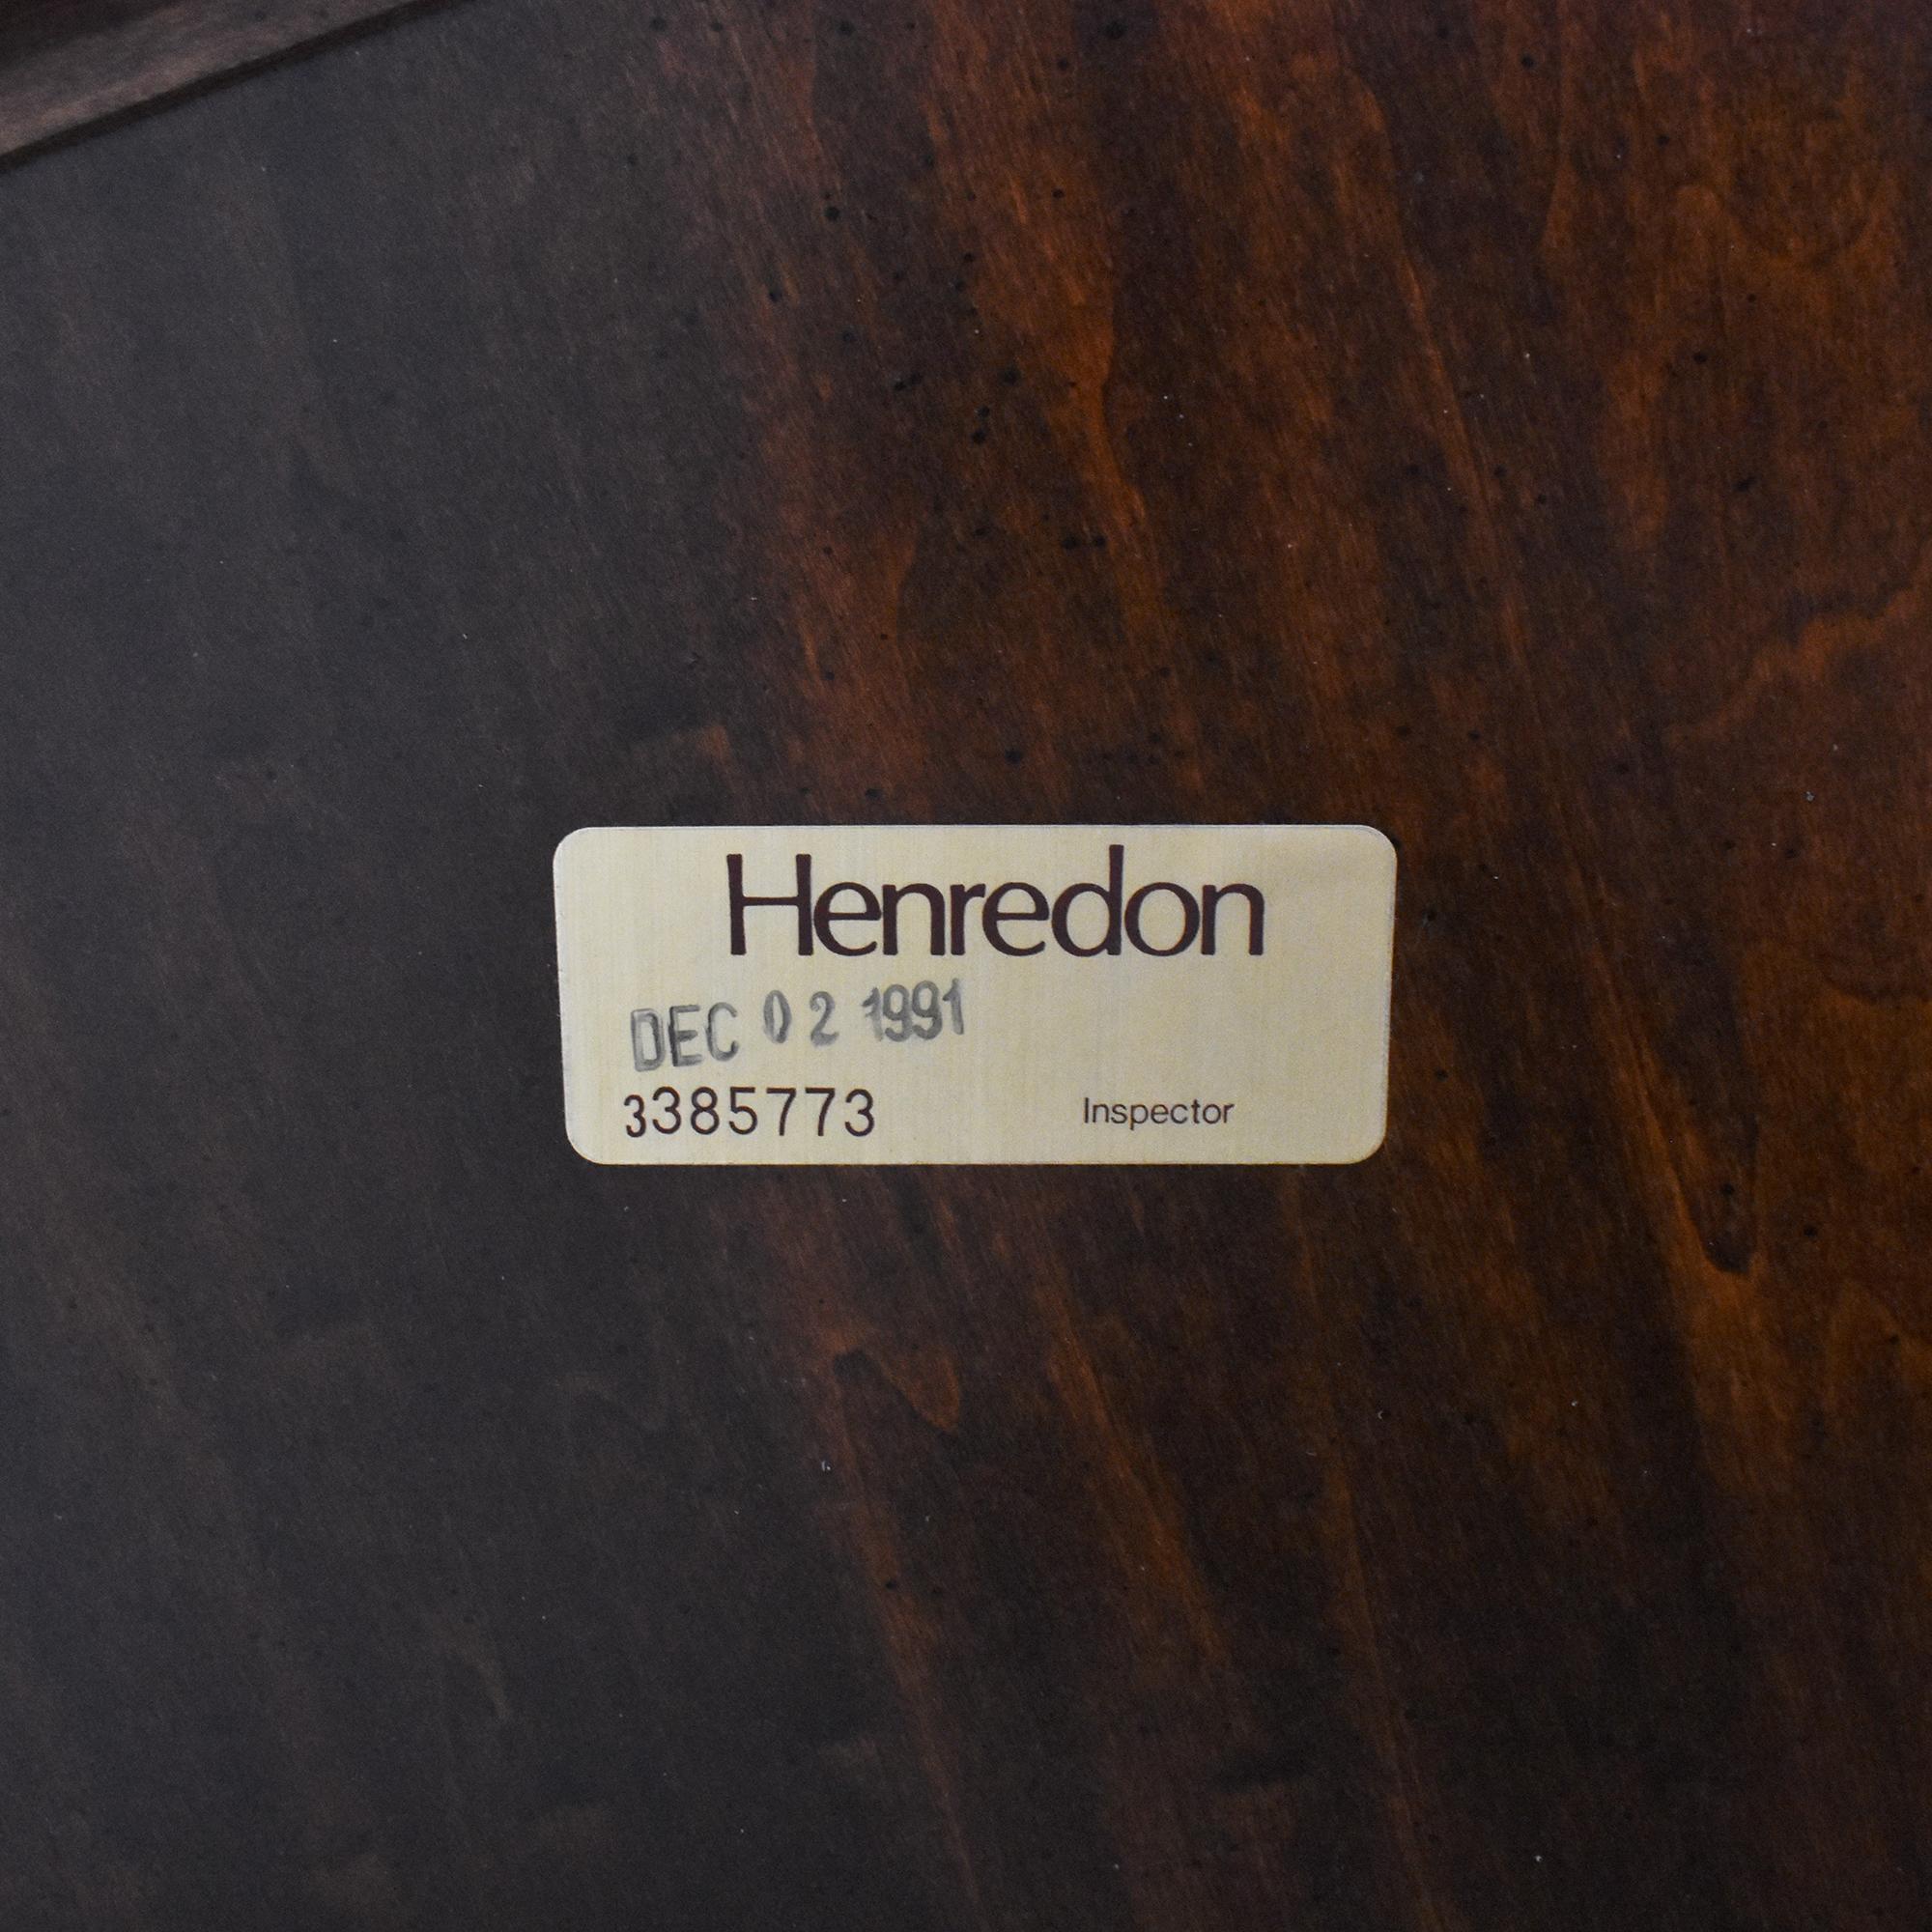 Henredon Furniture Henredon Furniture Aston Court End Table ct